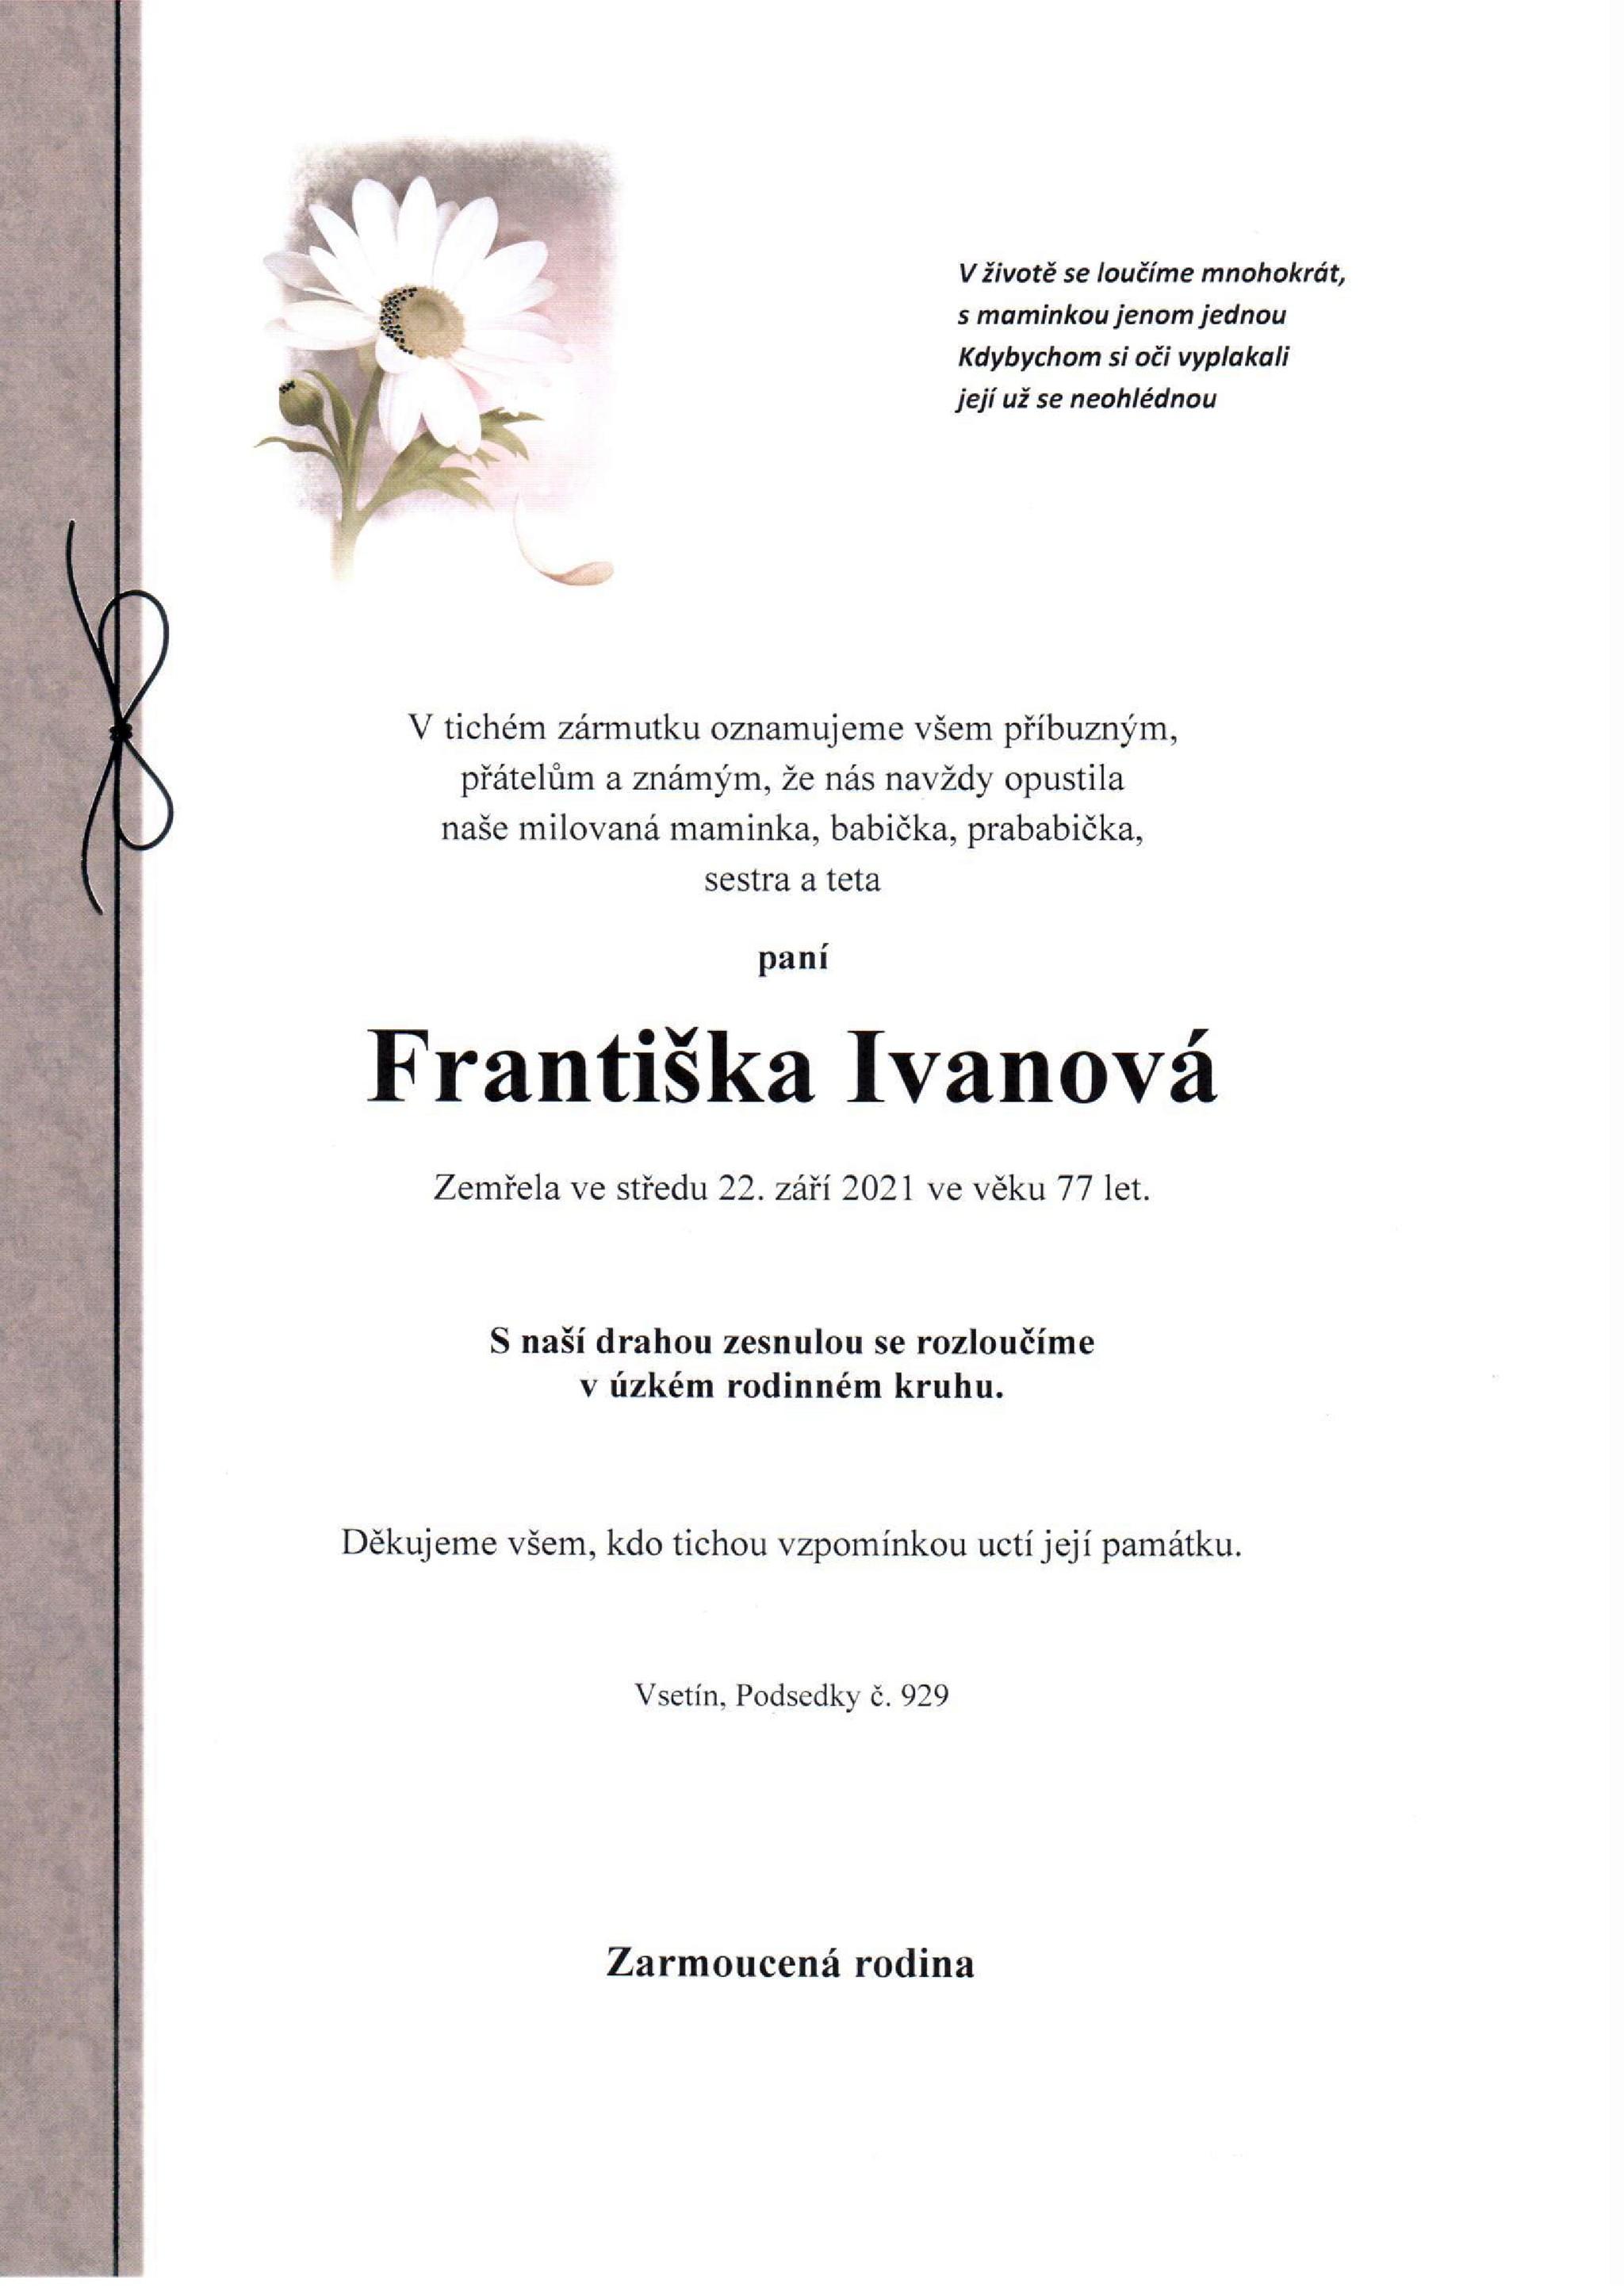 Františka Ivanová